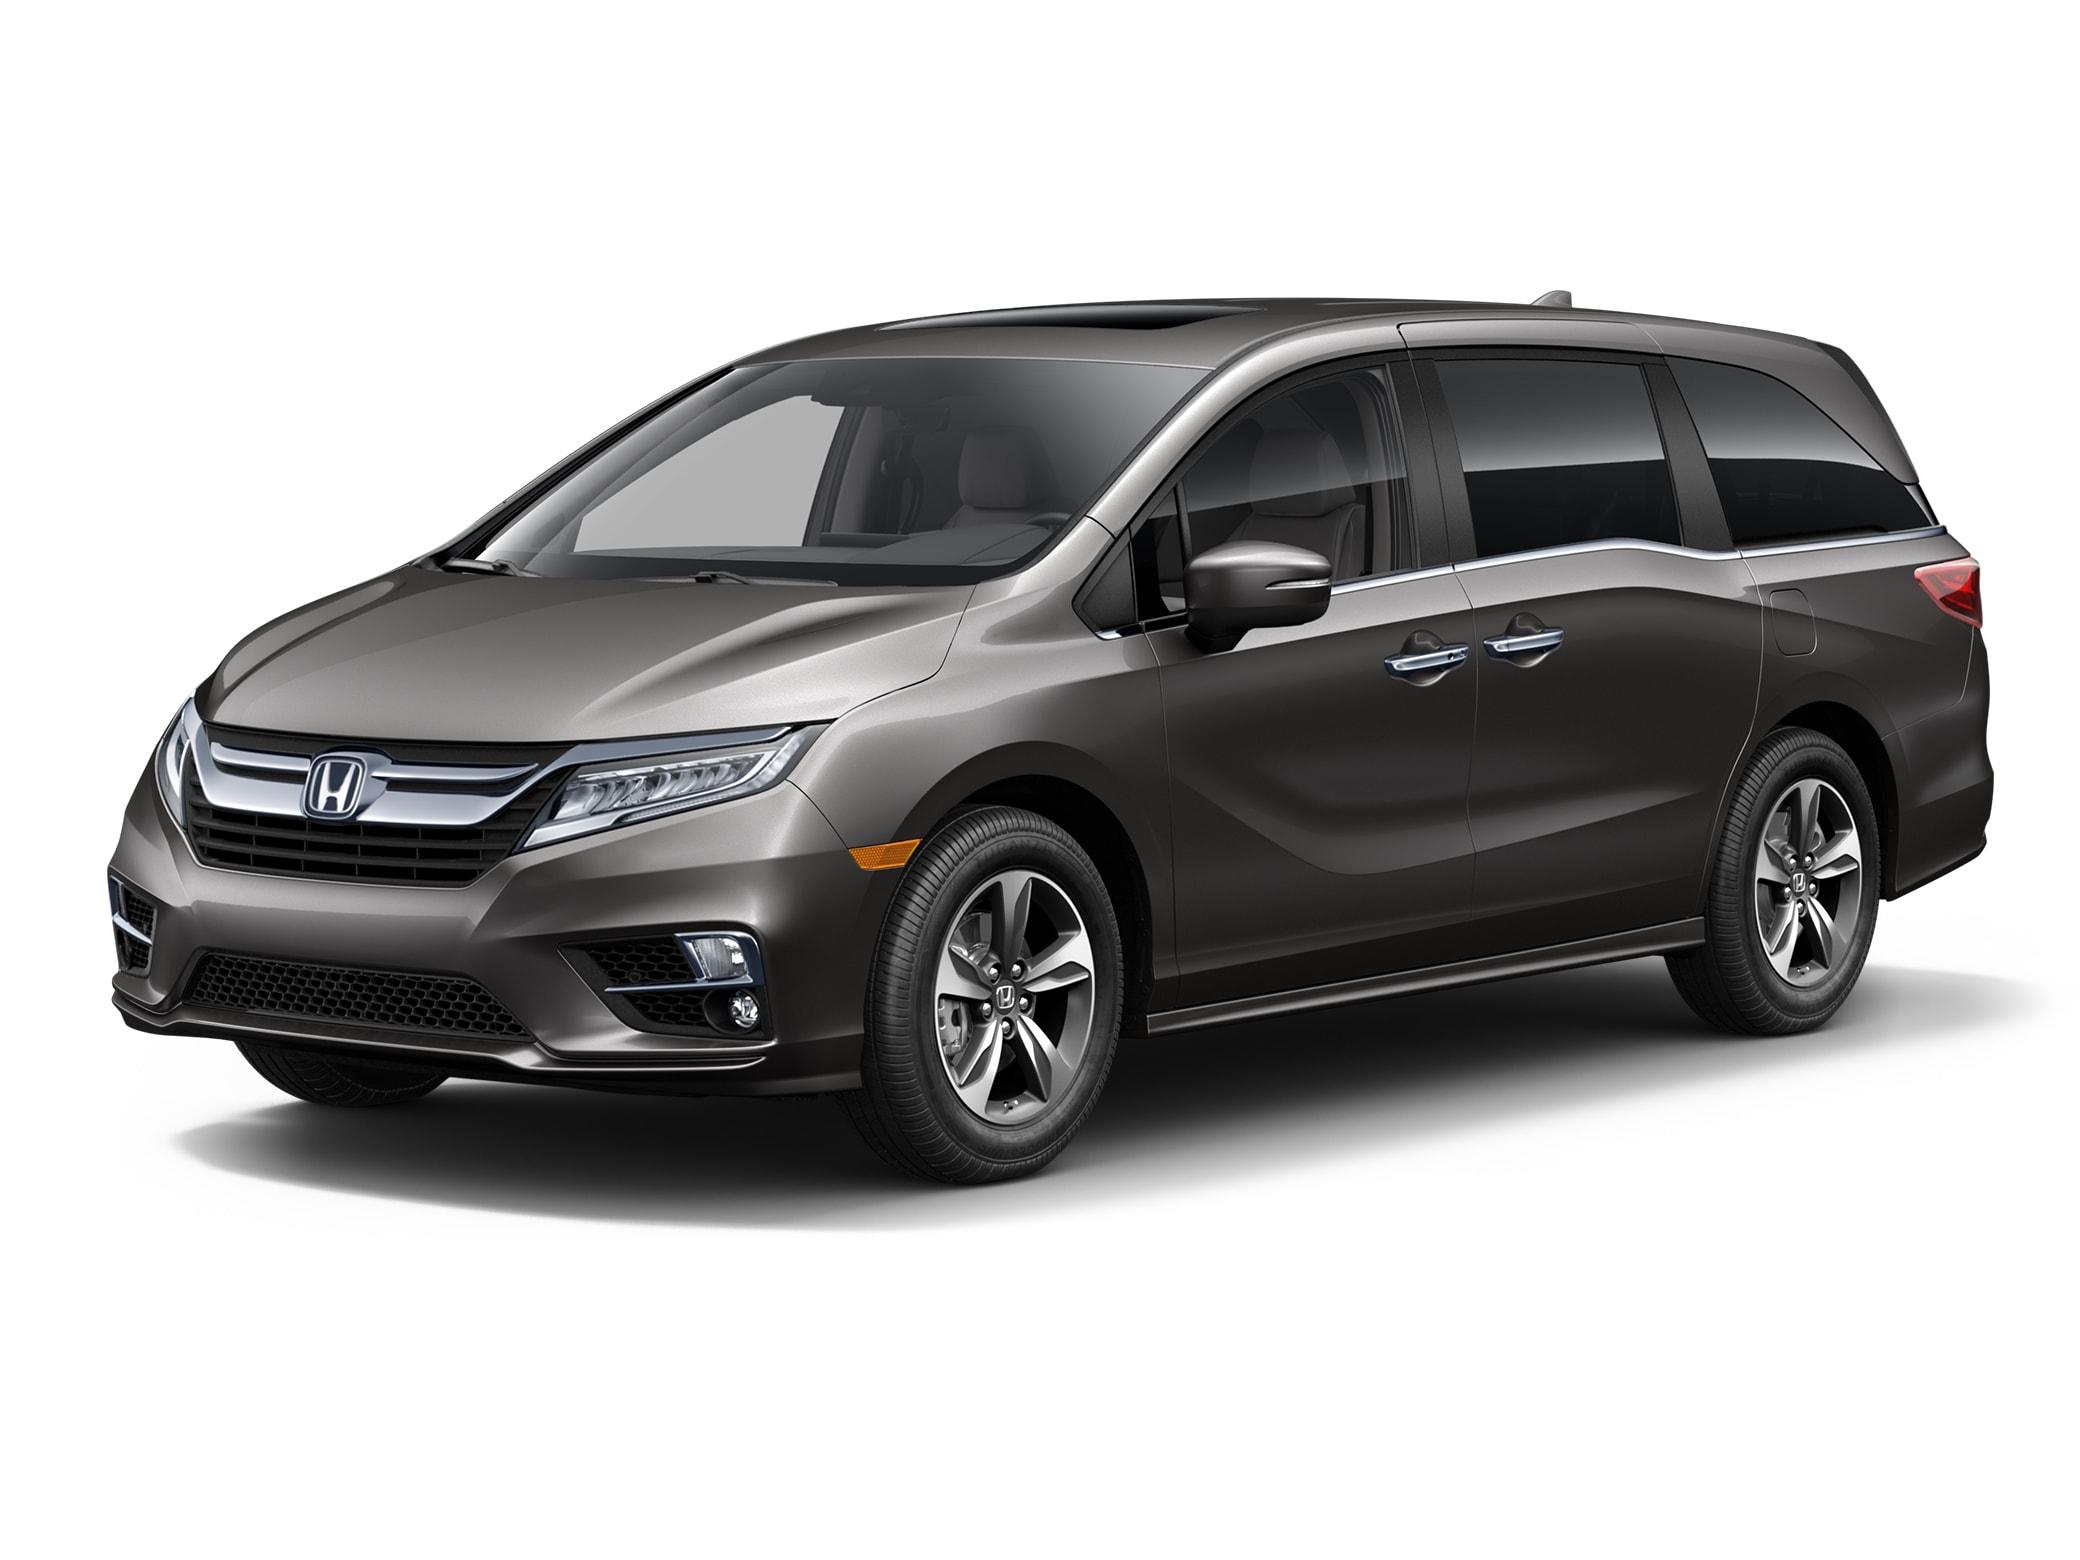 Honda Odyssey For Sale In Burlington Reading Ma Area Specs 2015 Oil Filter Location 2019 Touring Van